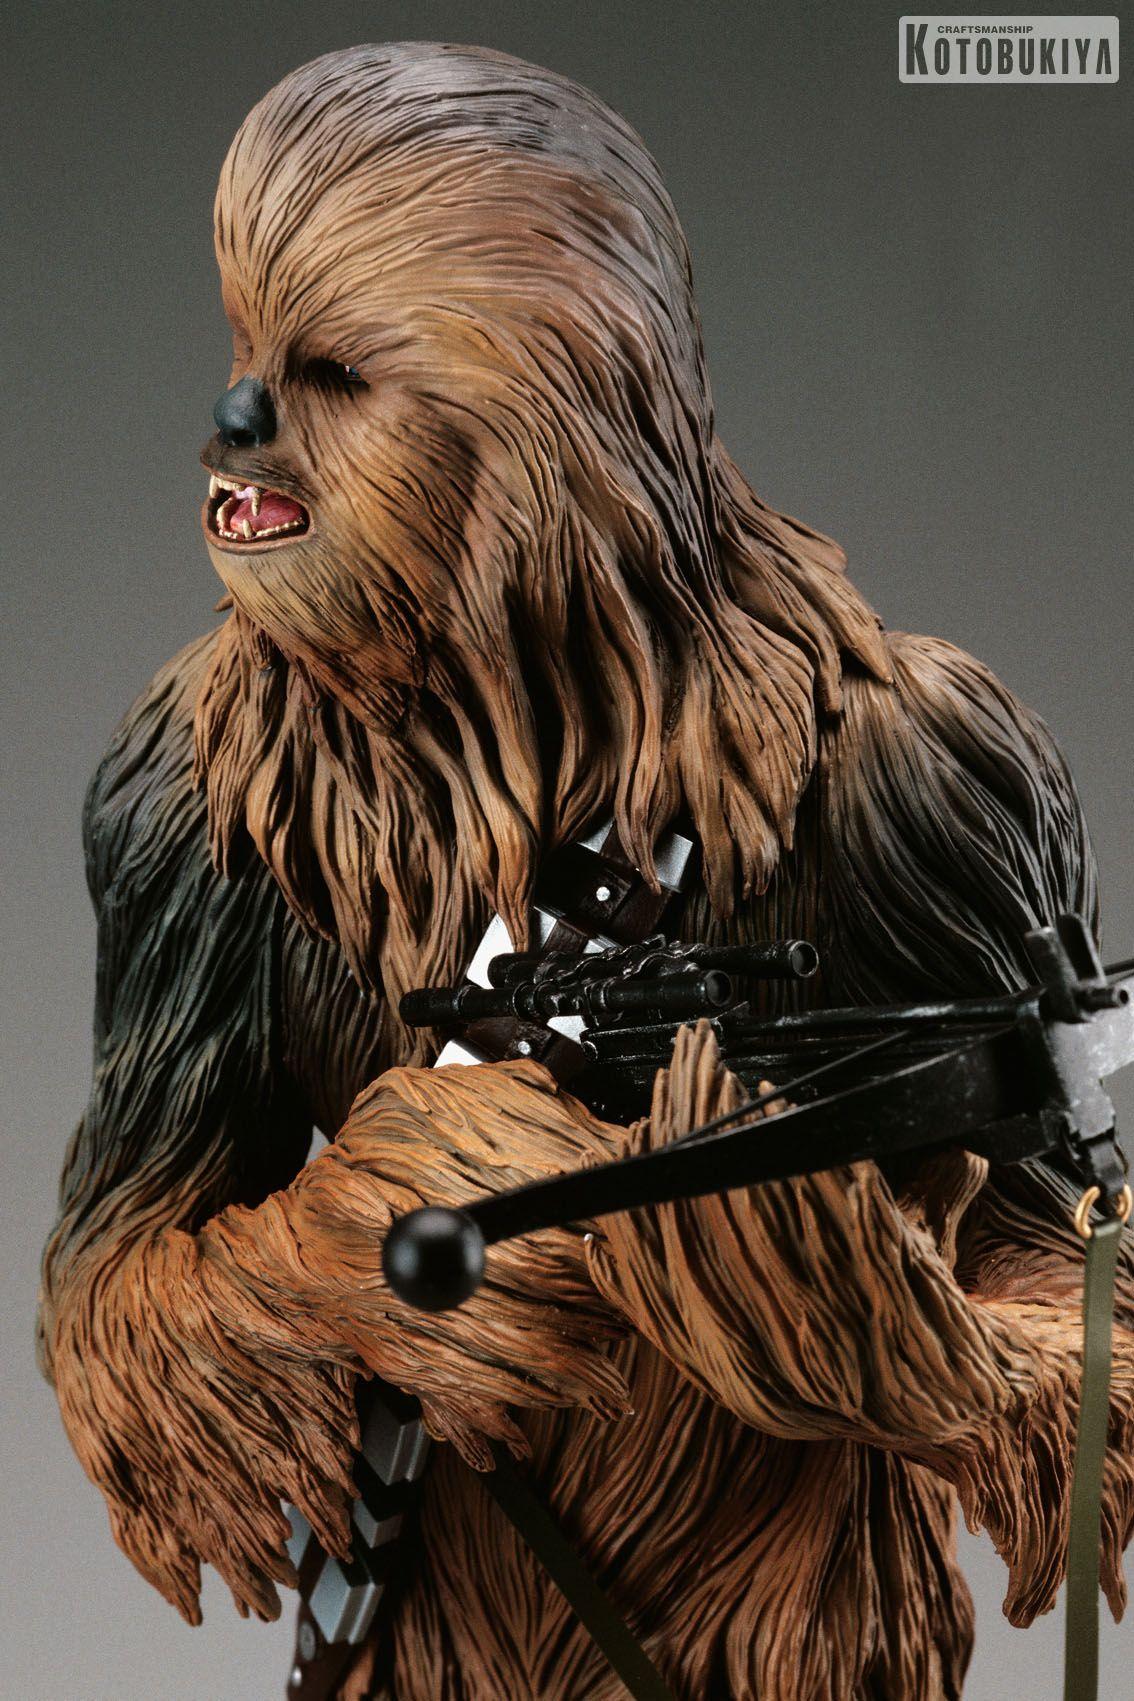 Chewbacca grrrrrrrrrr lol chewbacca lion sculpture